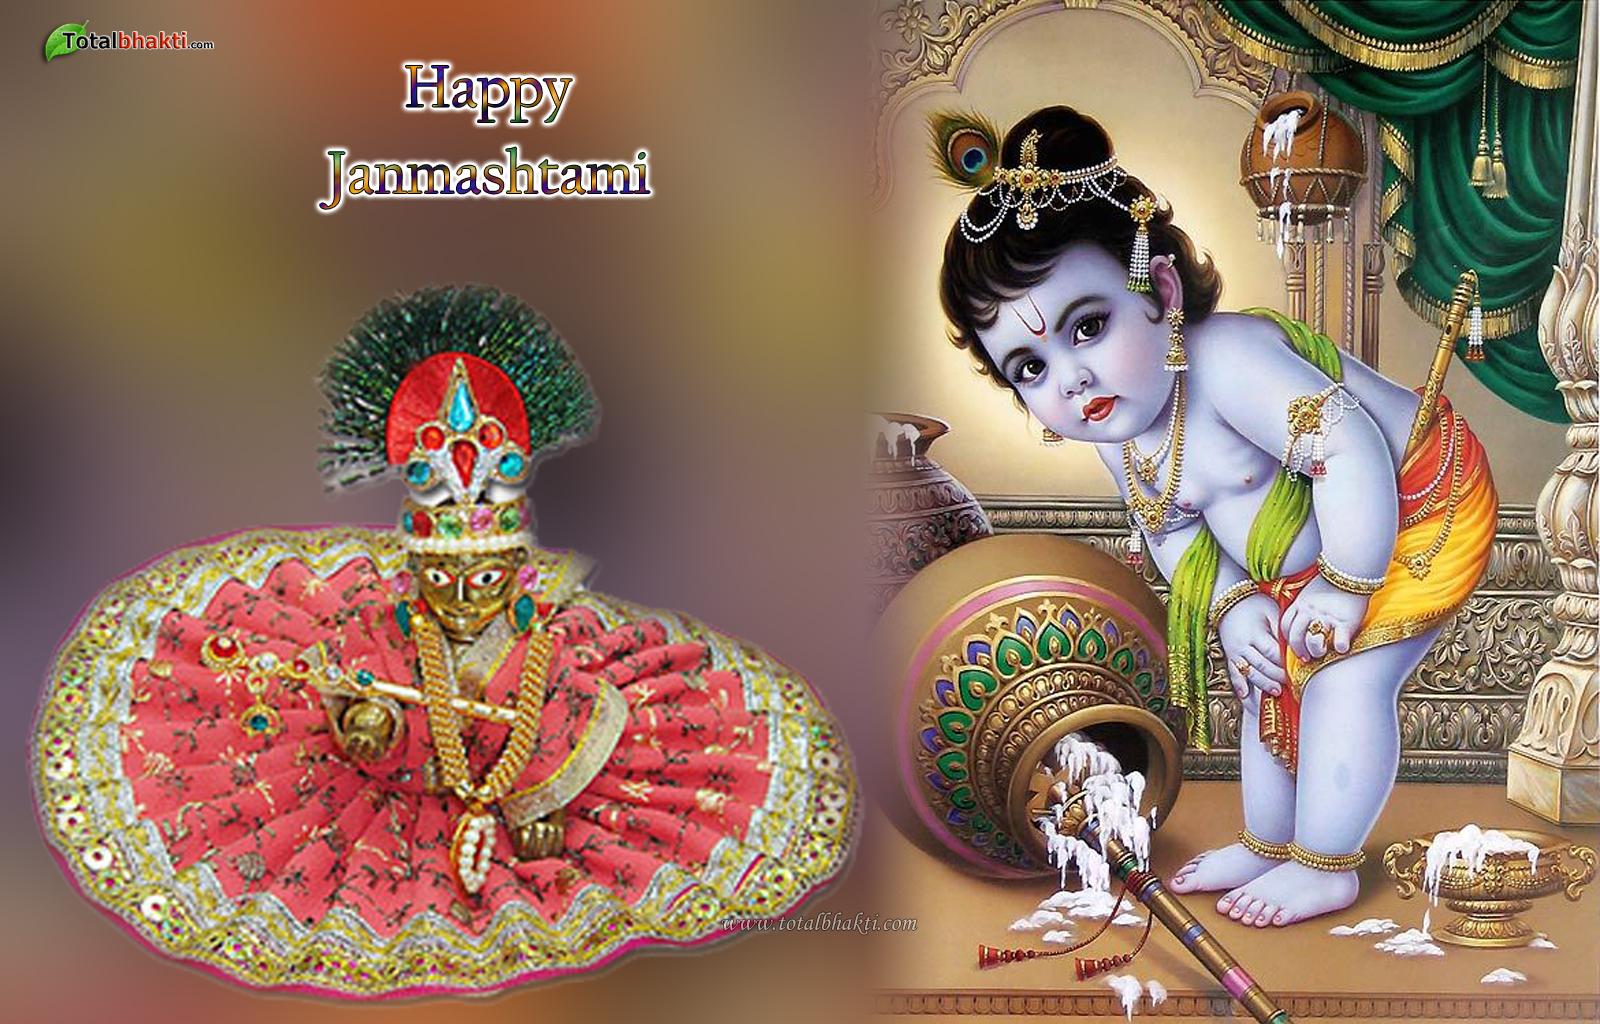 Ghanshyam Maharaj Wallpaper Hd Jay Swaminarayan Wallpapers Bal Krishna Photo